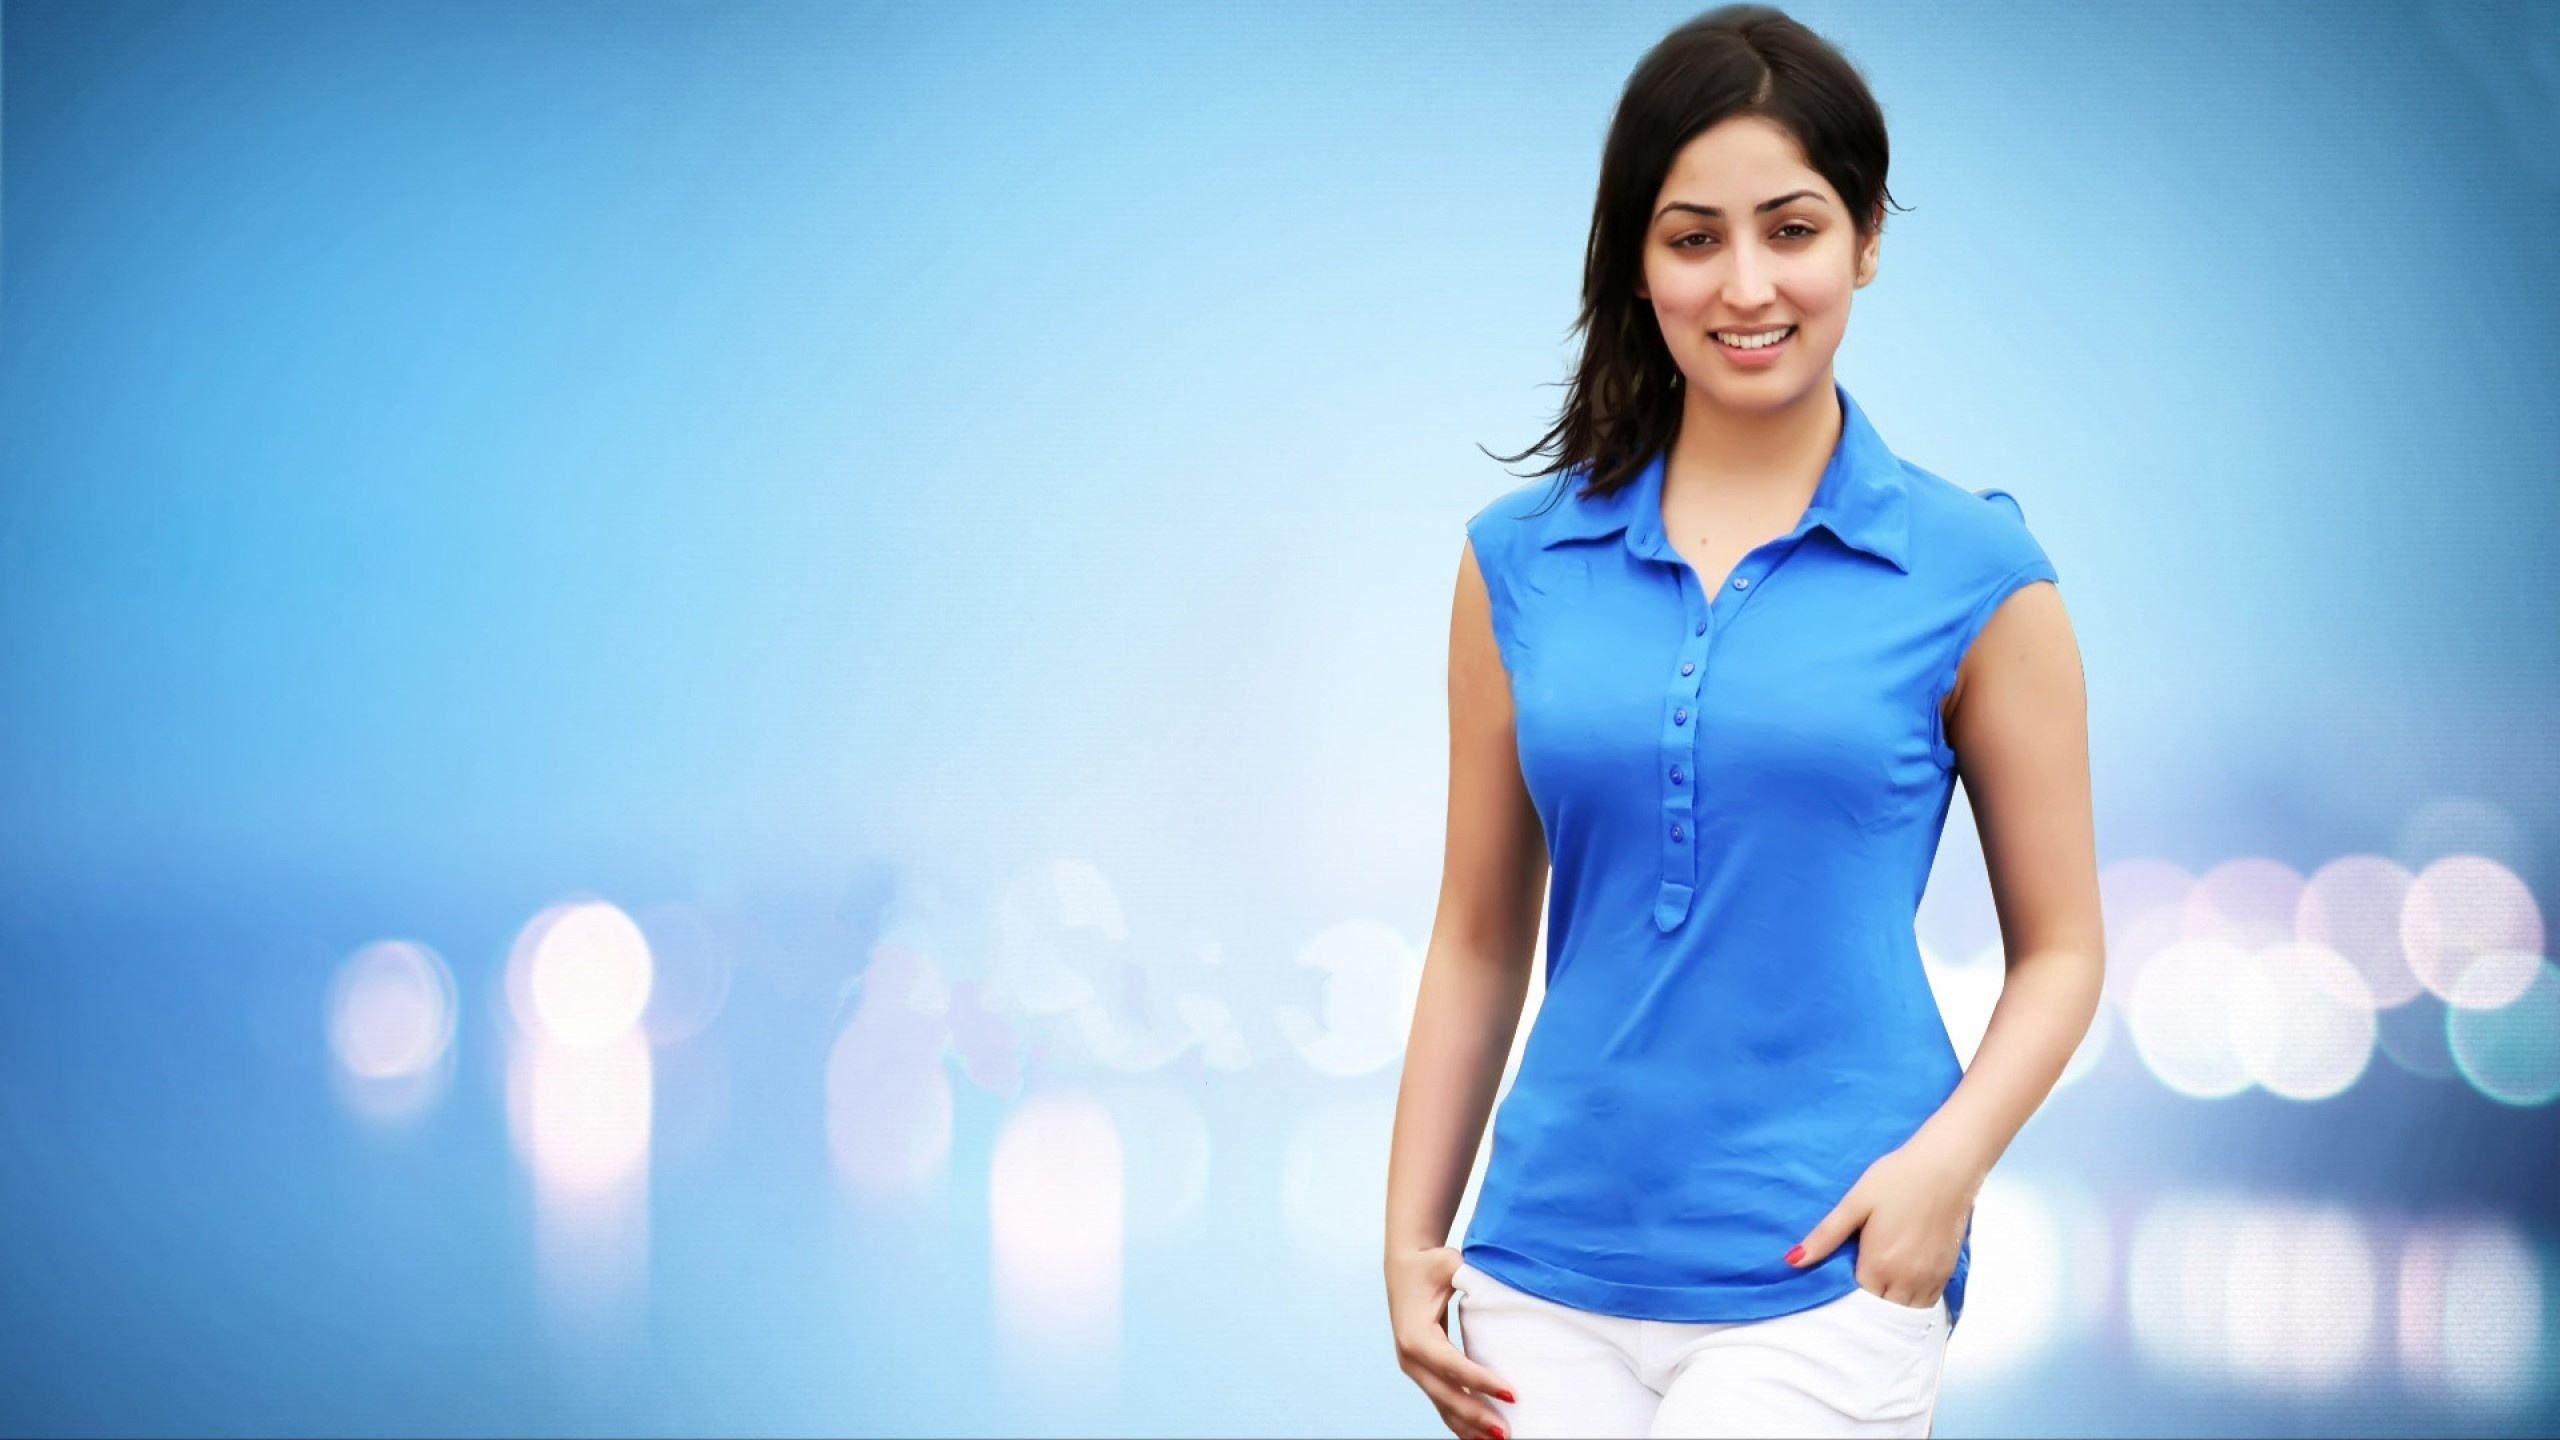 Yami Gautam Woman Girl Full HD Hot Wallpaper Free - Download Yami